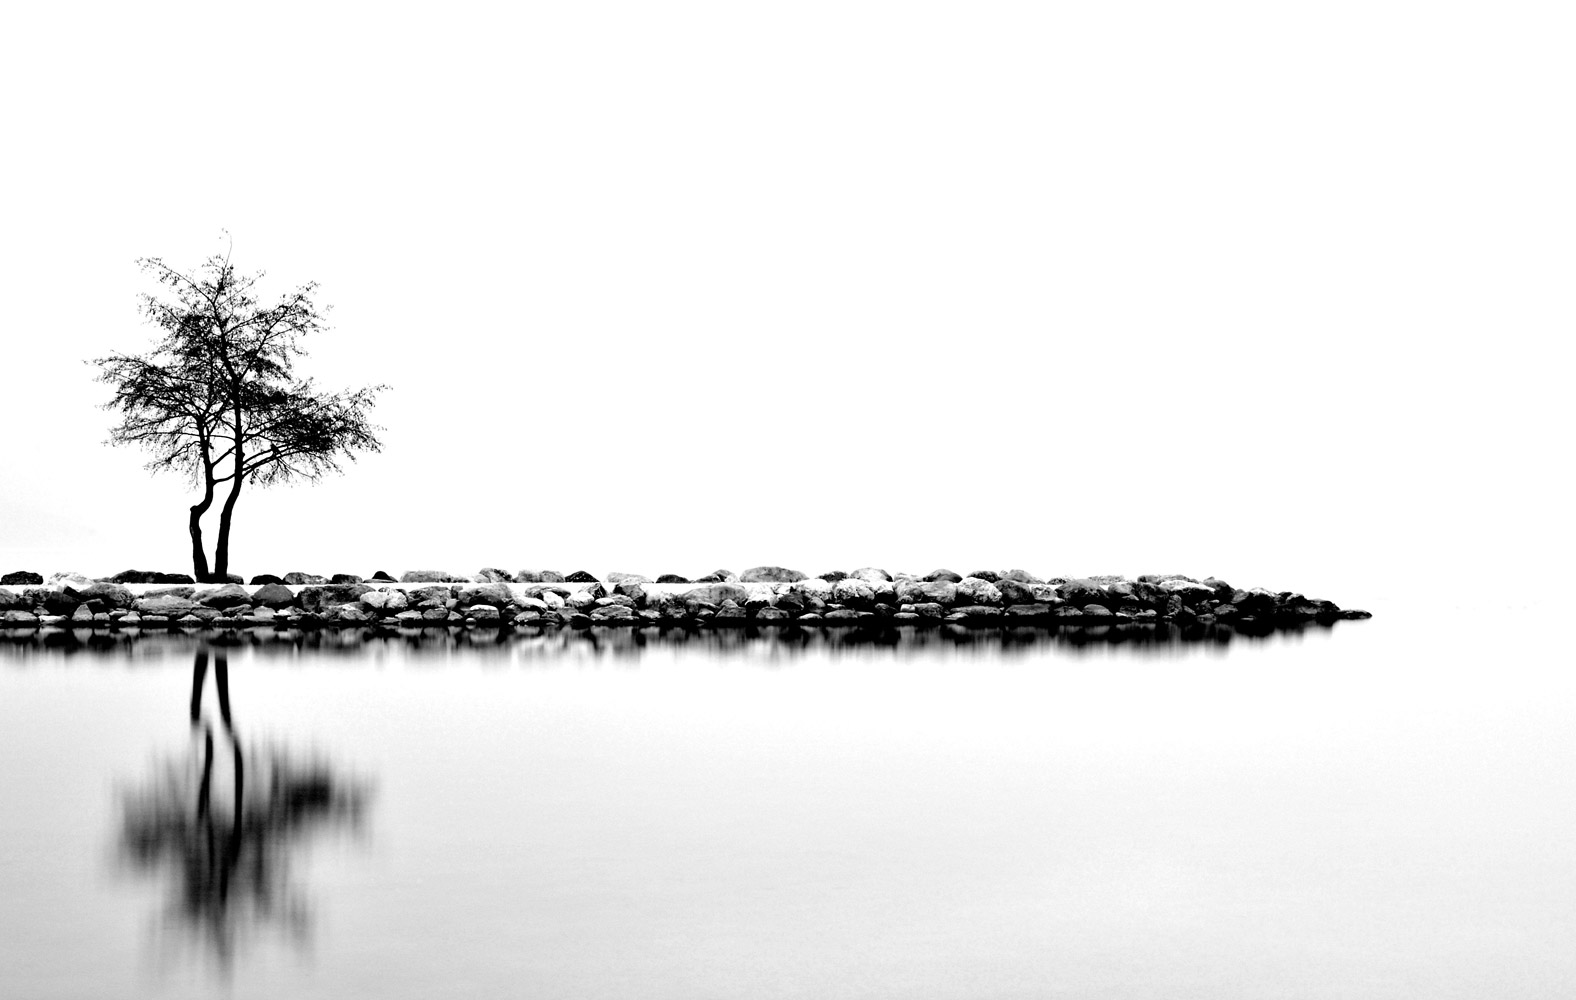 Одинокое дерево, © Ими Кётц, Пейзажи, Фотоконкурс CEWE